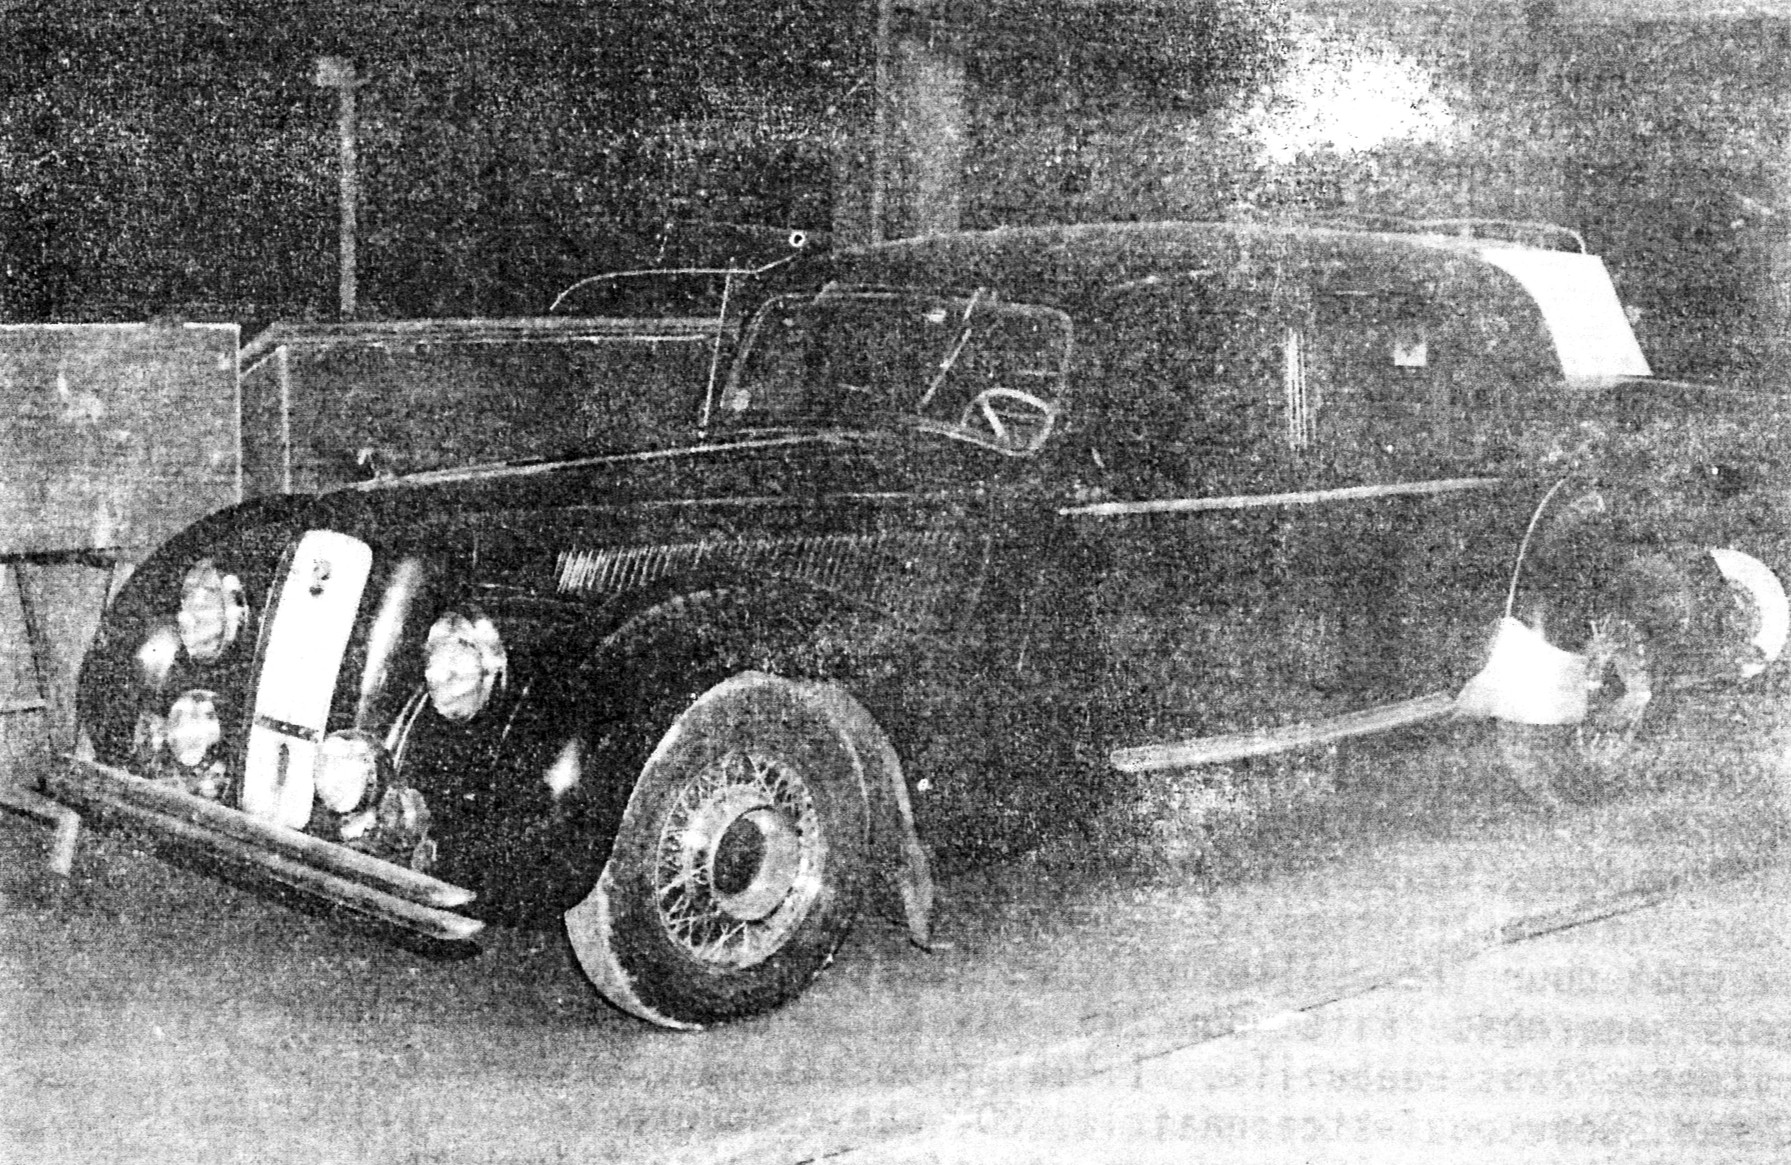 1952 Traction 15 spendilux